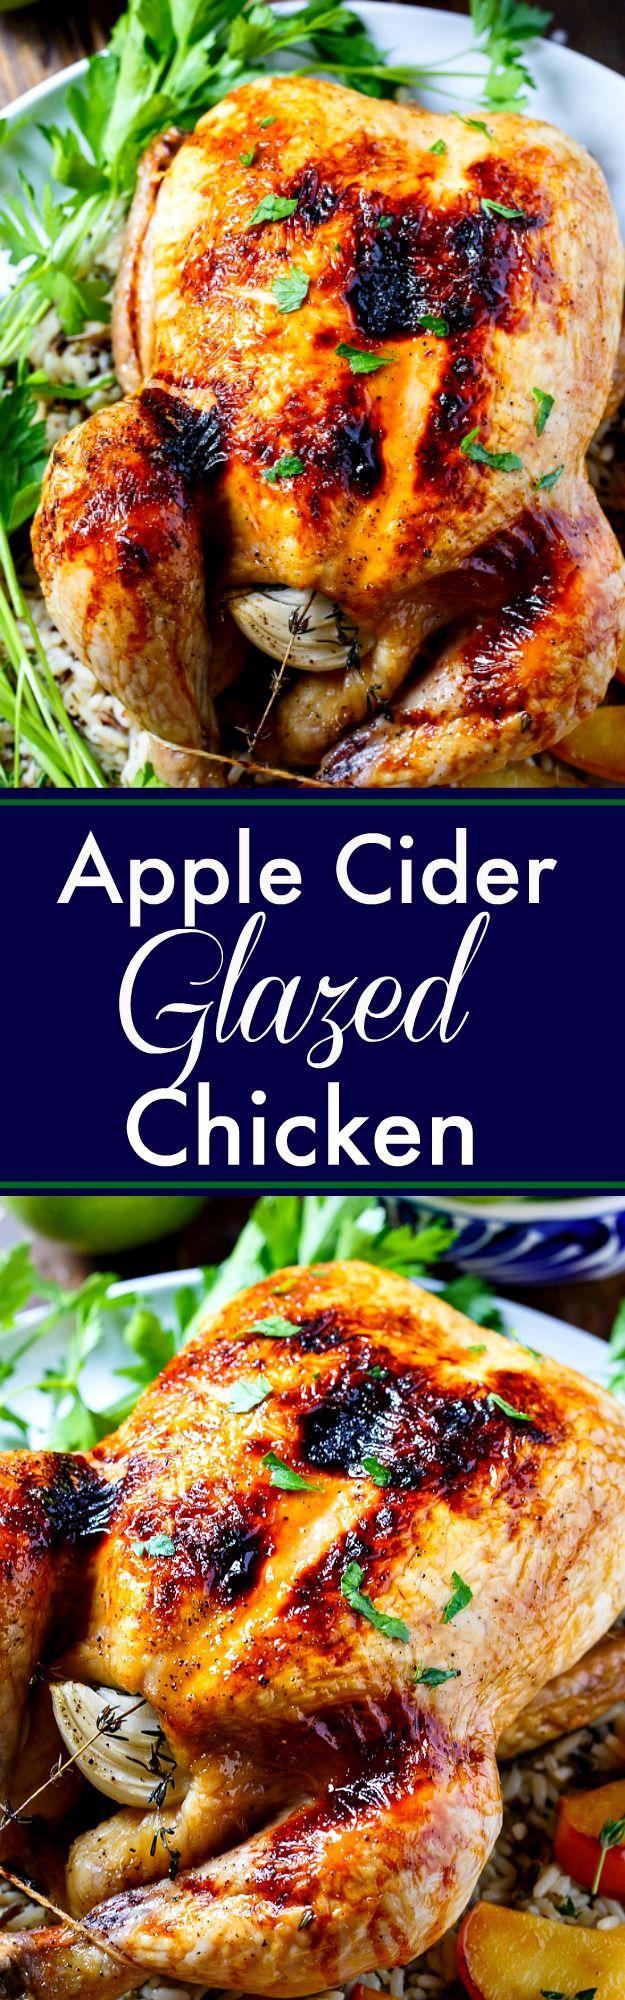 Apple Cider Glazed Roasted Chicken- fall comfort food.